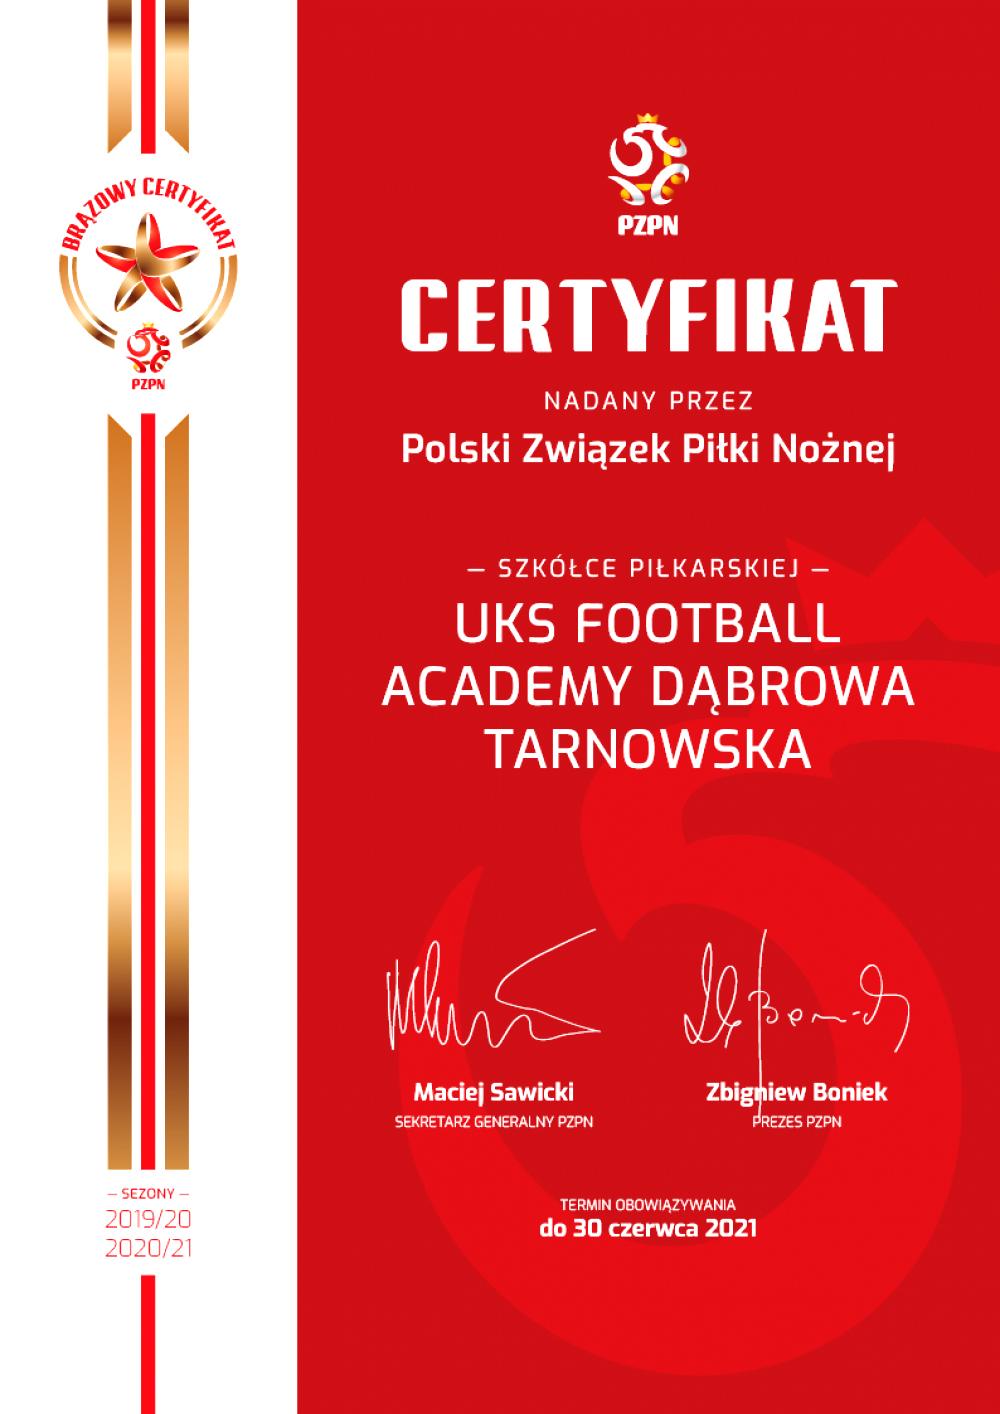 Brązowy Certyfikat PZPN Football Academy Dąbrowa Tarnowska 2019 Dąbrowska Football Academy z Brązowym Certyfikatem Szkółek Piłkarskich PZPN